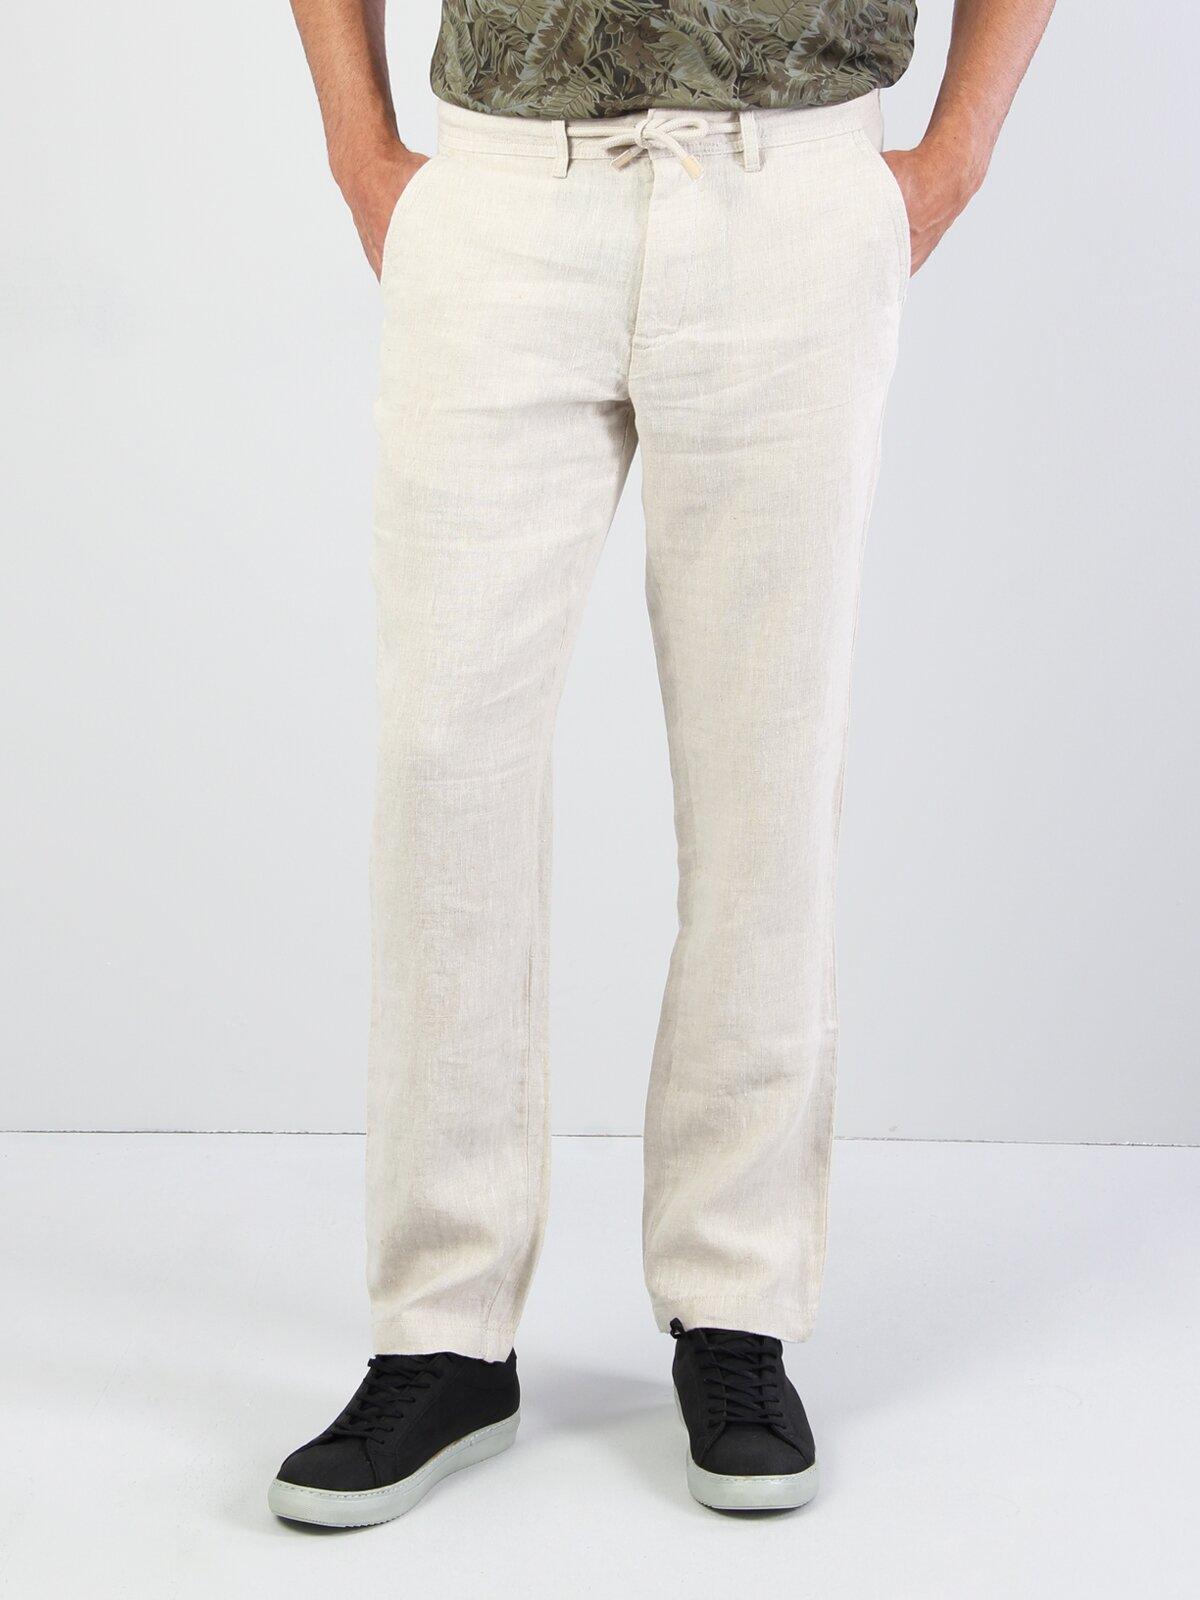 Rahat Kalıp Yüksel Bel Keten İnce Beige Erkek Pantolon